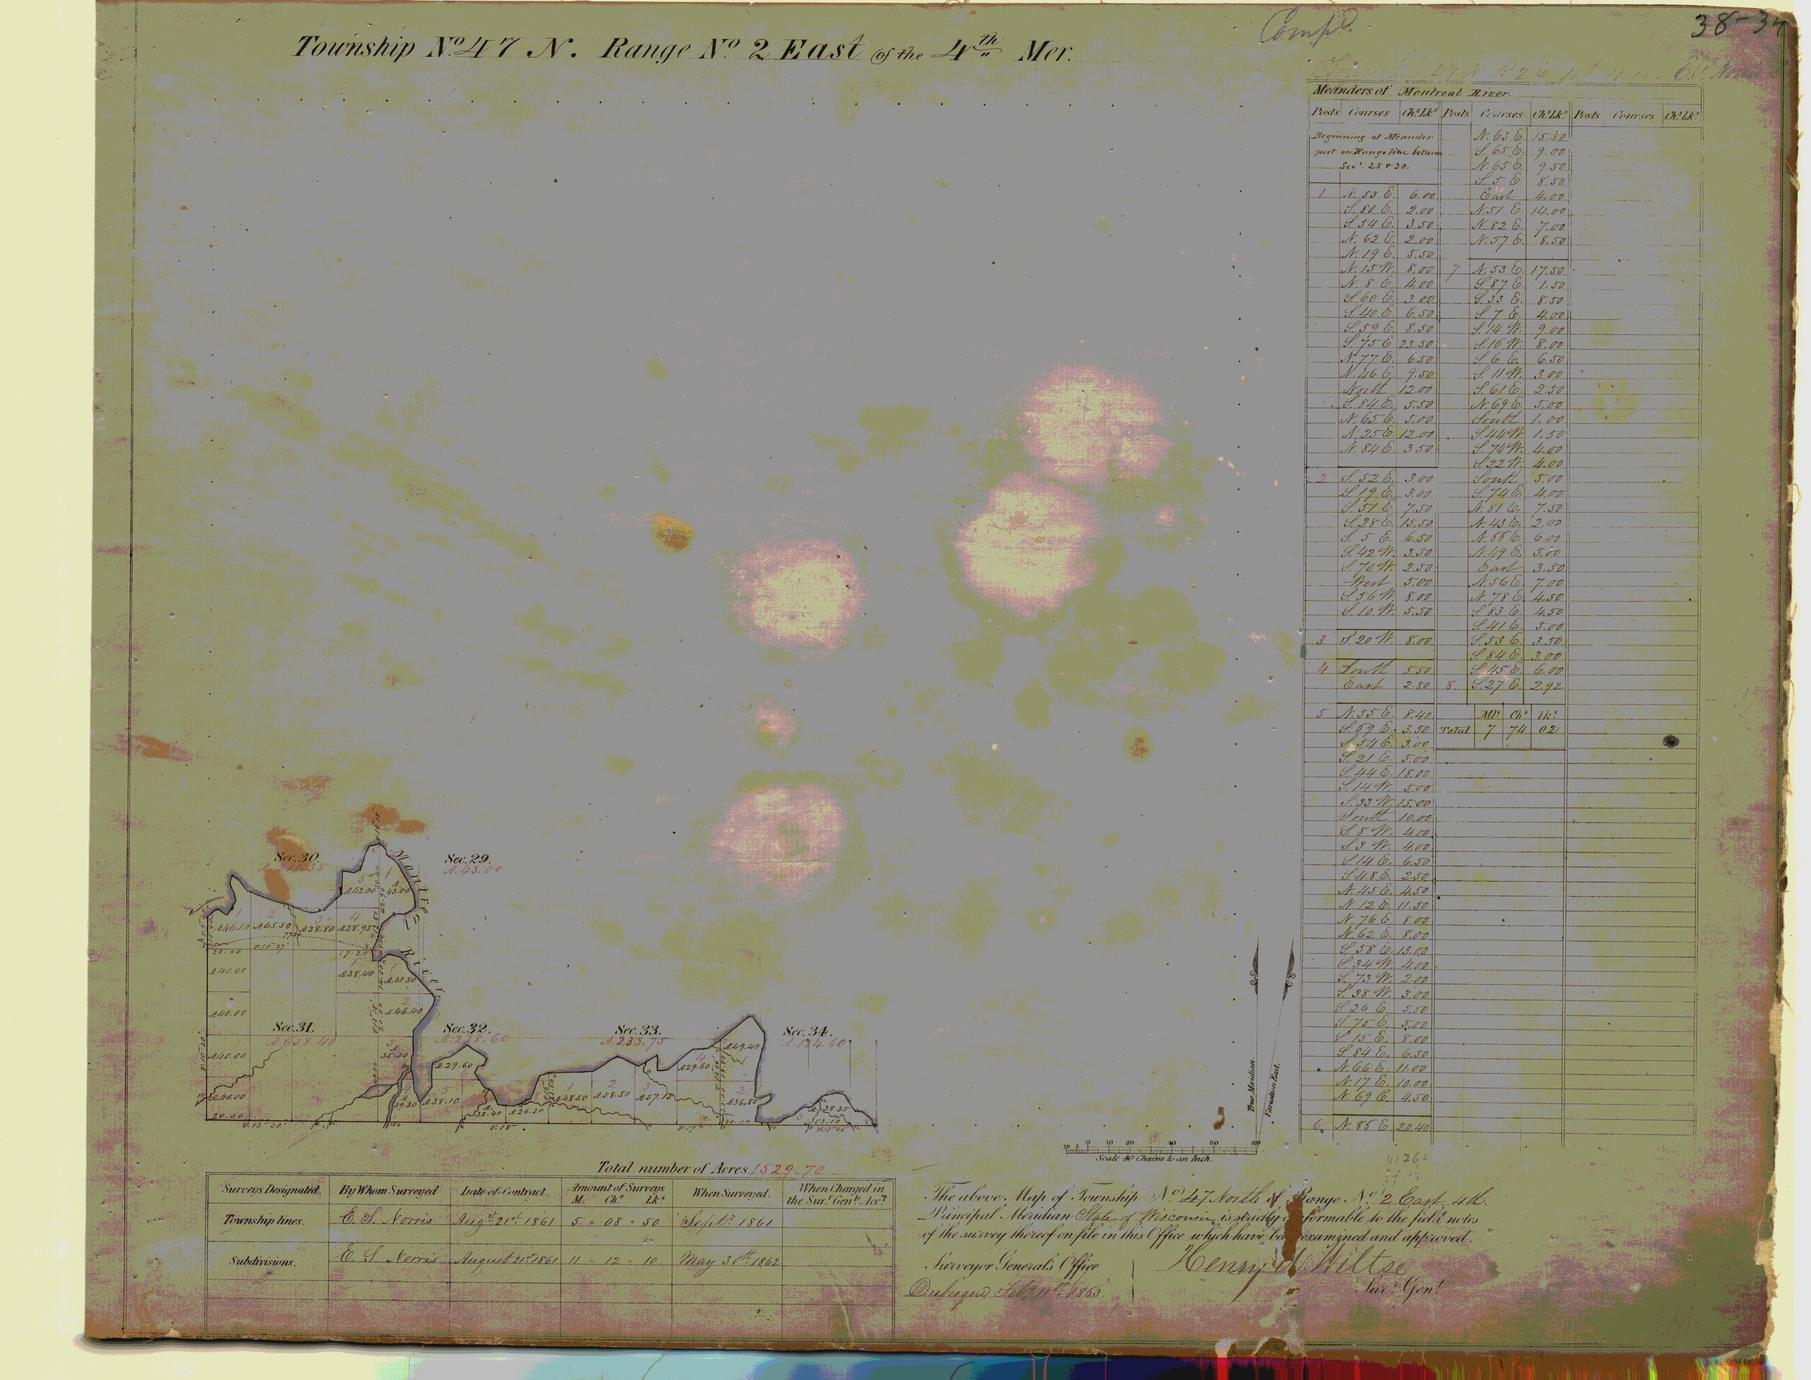 [Public Land Survey System map: Wisconsin Township 47 North, Range 02 East]